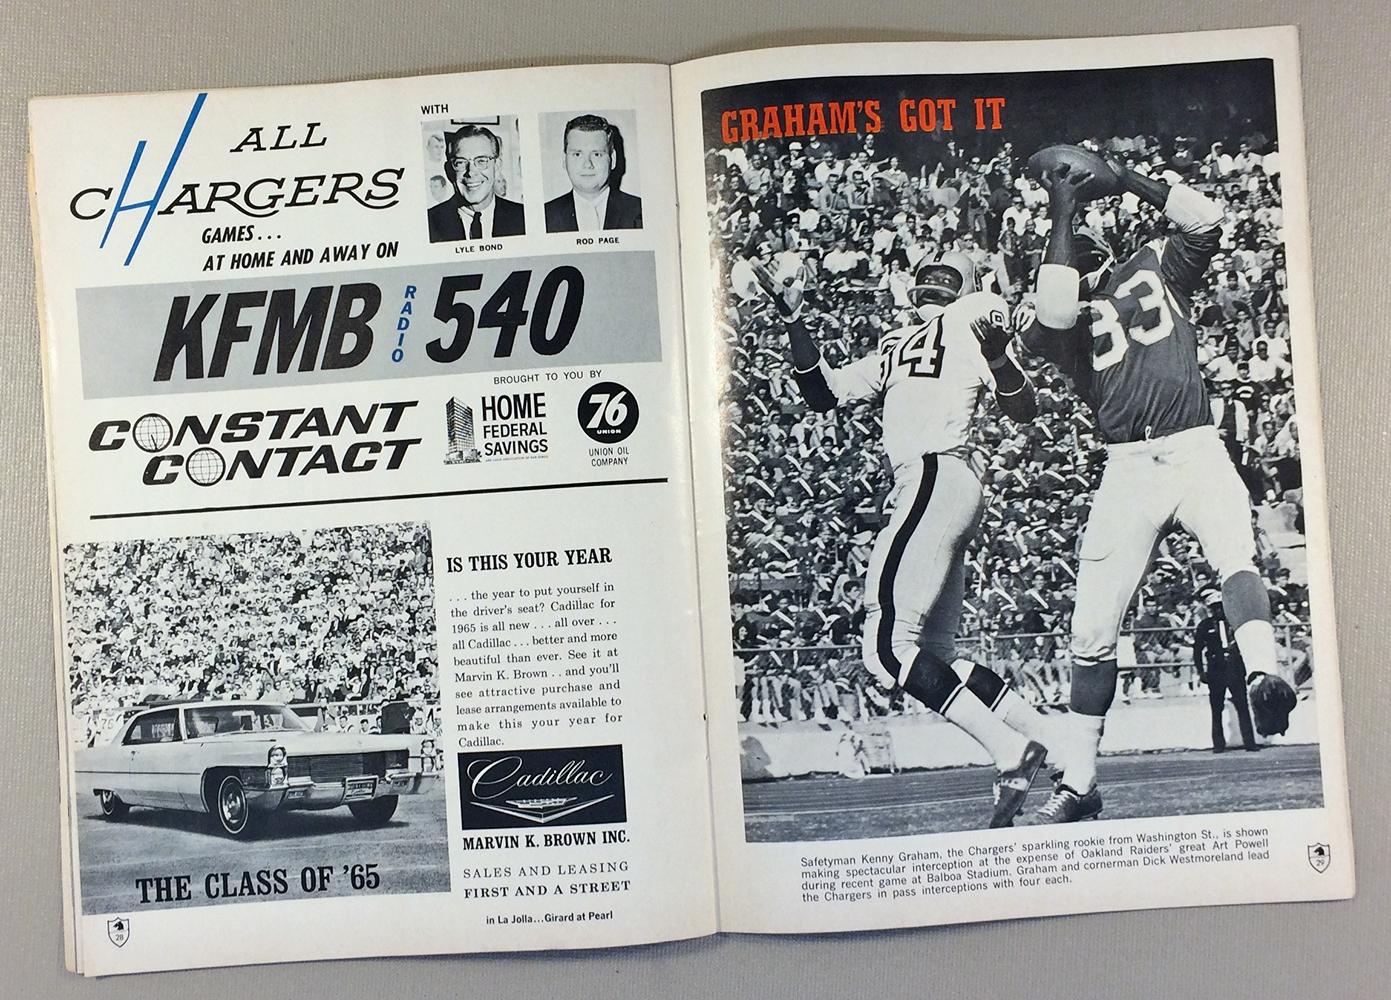 football_afl_chargers_bills_1964_E.jpg